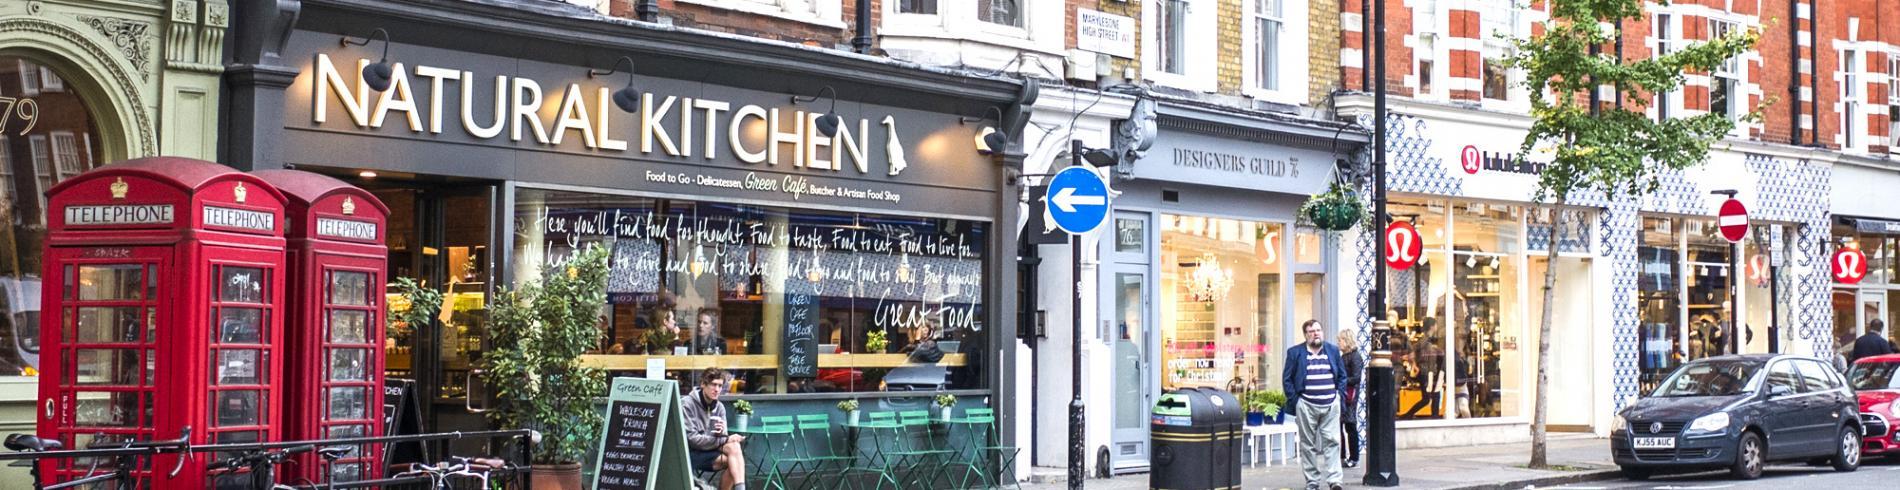 Shops and restaurants along Marylebone High Street